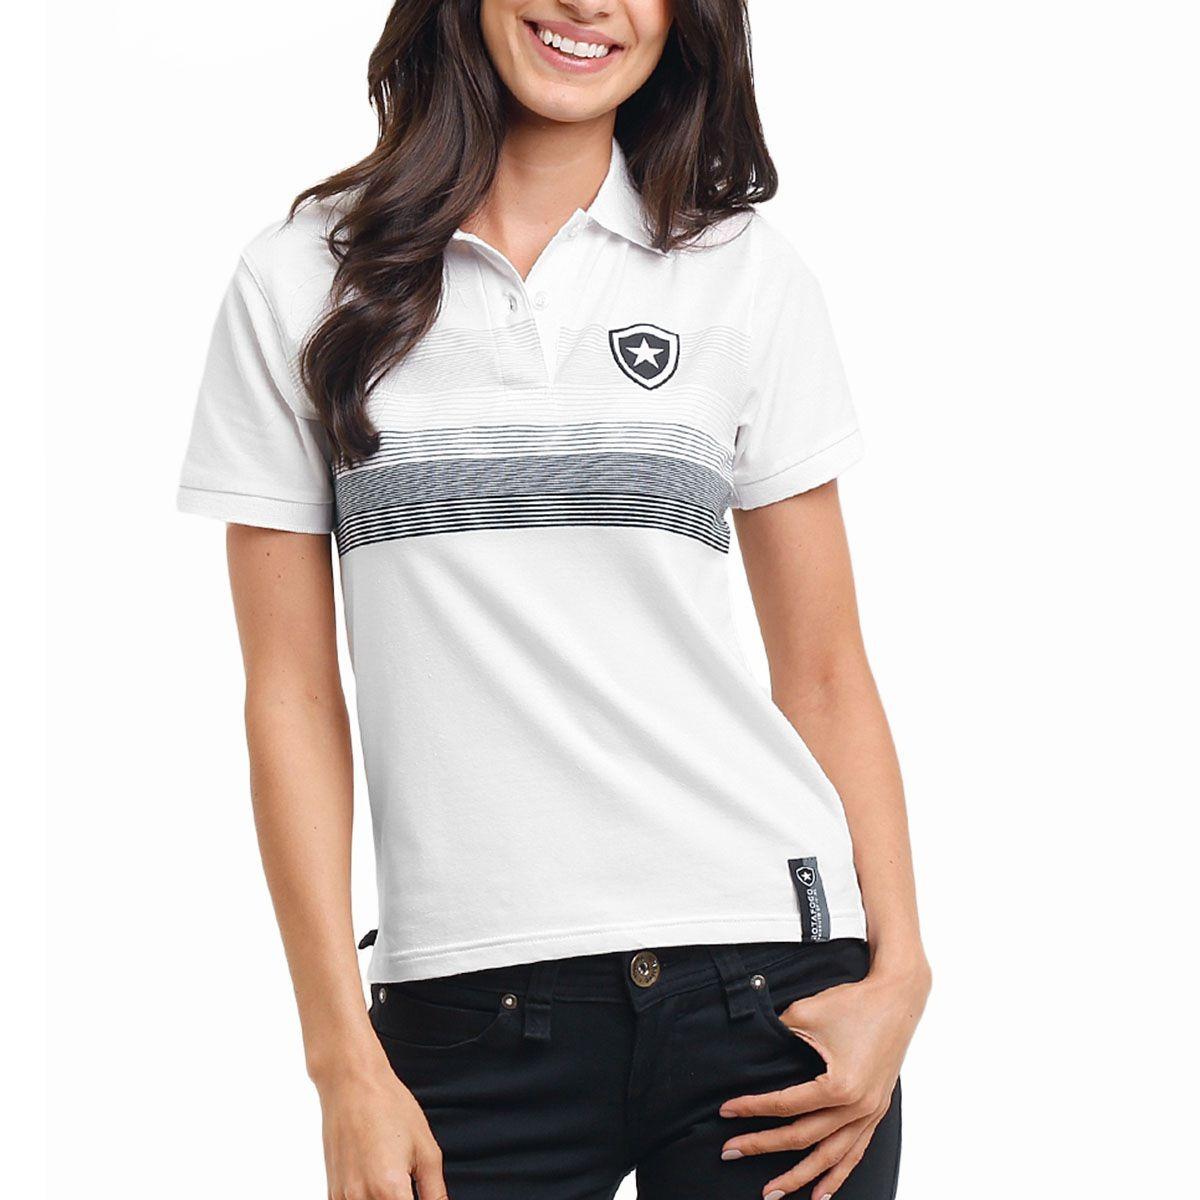 5e1952f366 kit c 2 camisas polo botafogo feminino oficial fio tinto+ nf. Carregando  zoom.